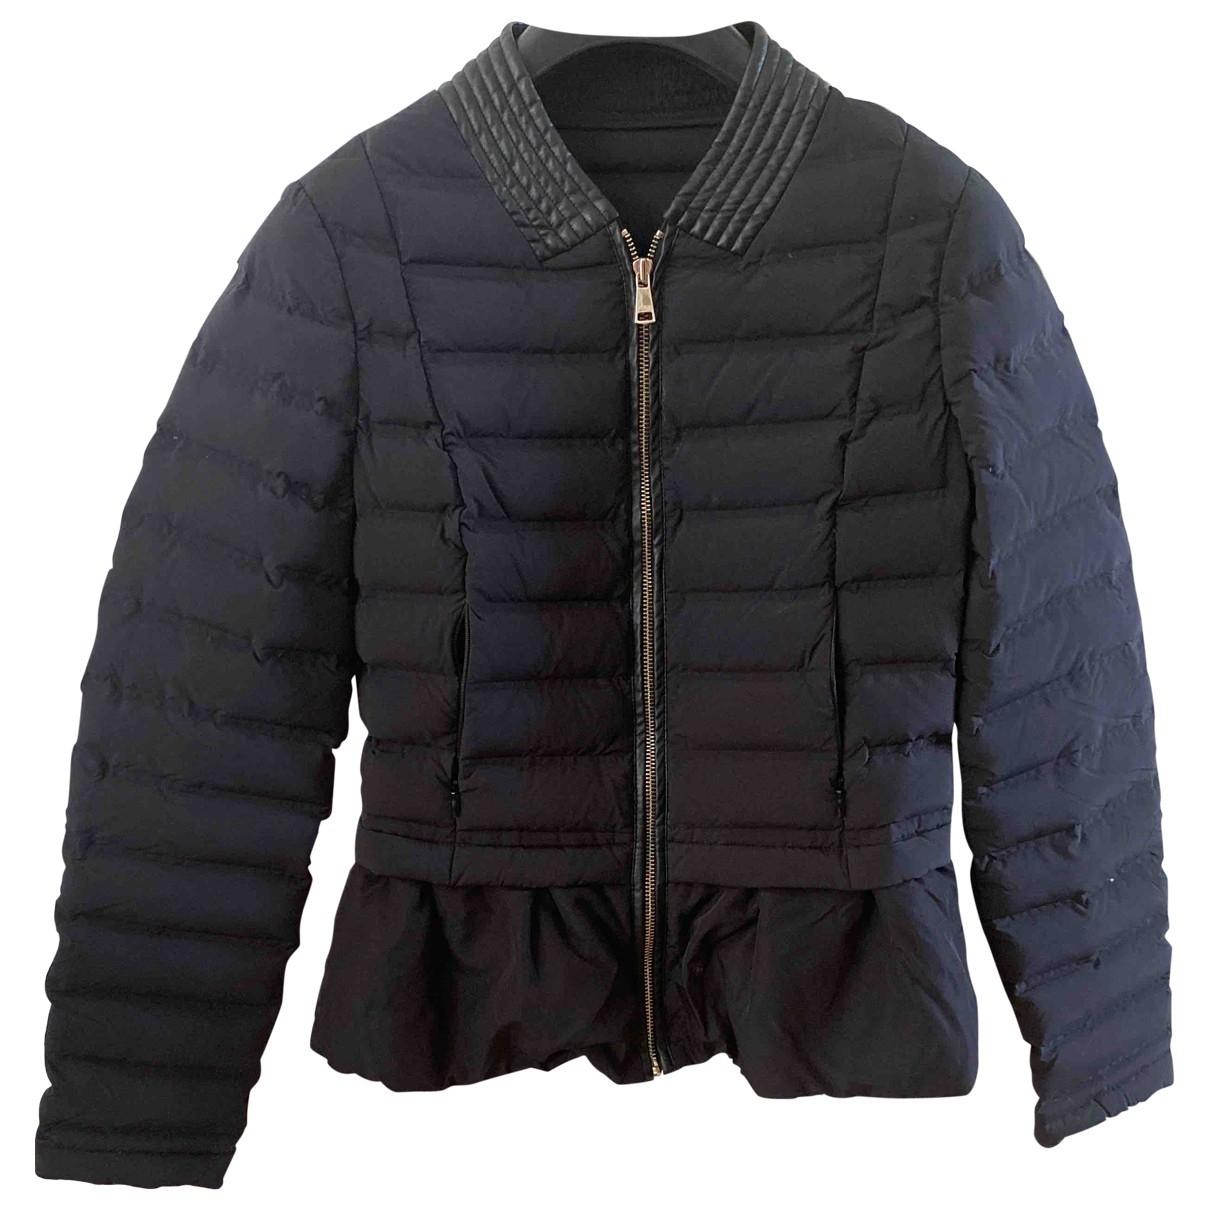 Guess \N Jacke in  Schwarz Polyester